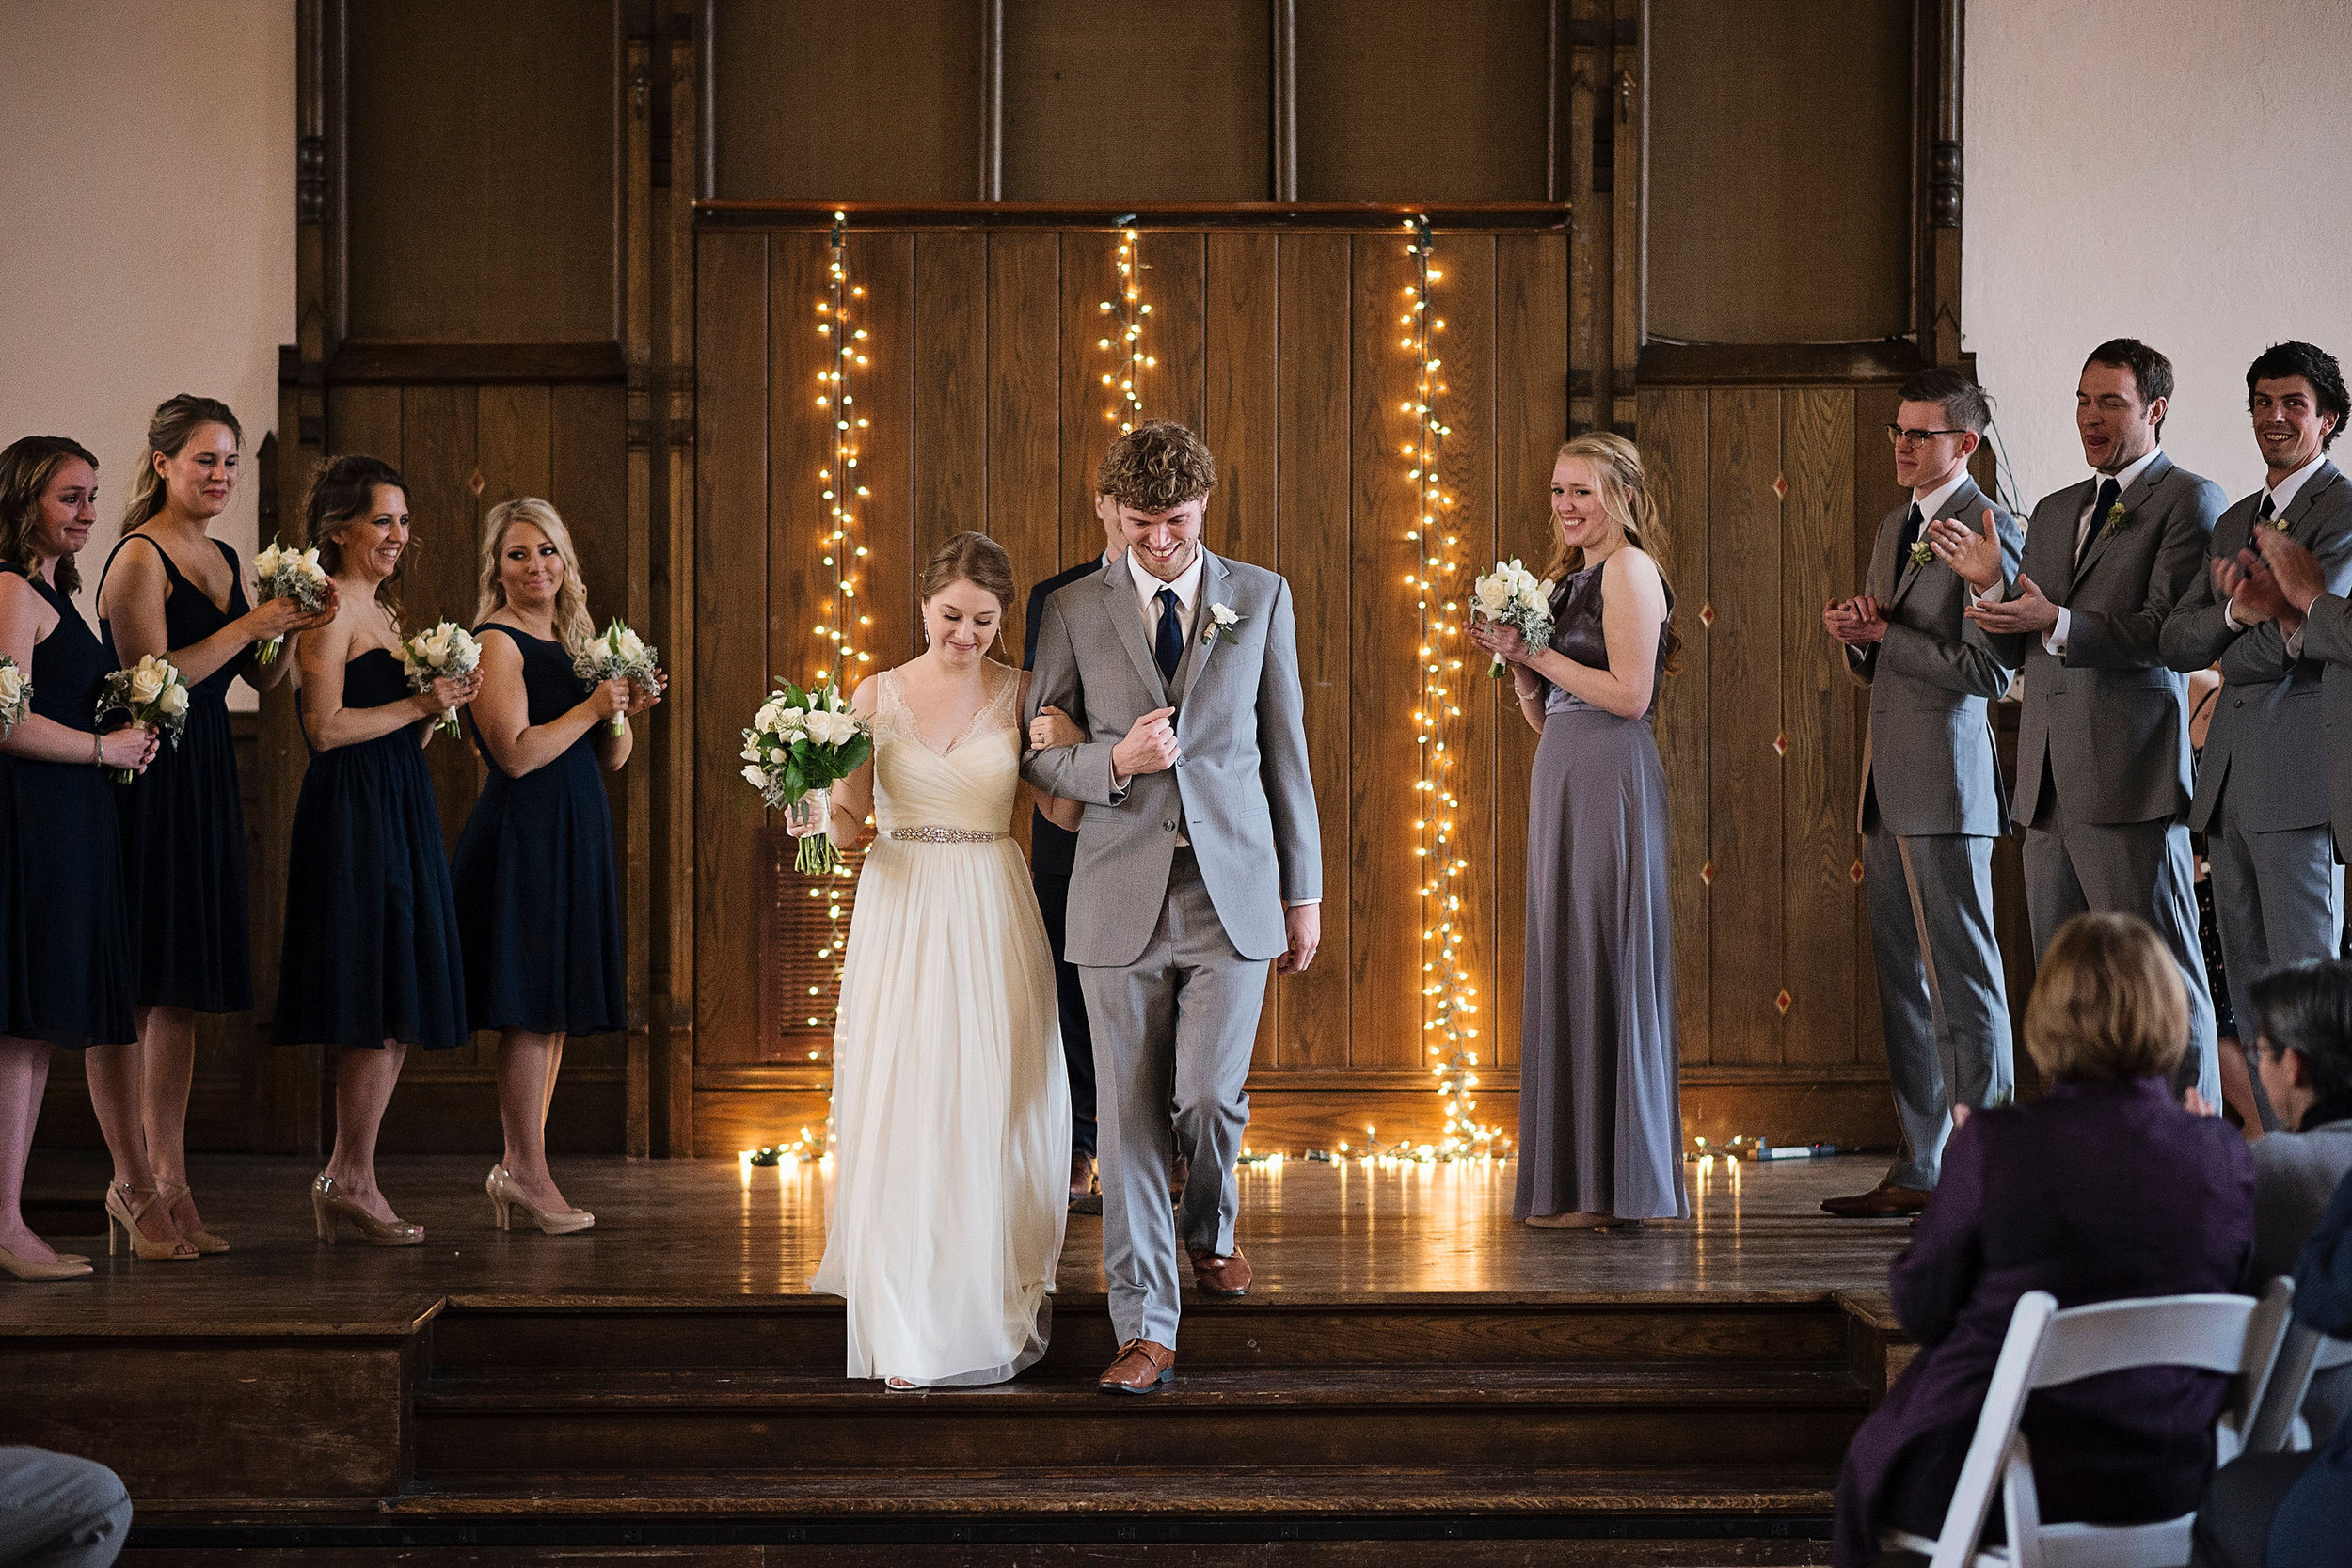 Old Brick Church - Iowa City, Iowa, Wedding Photographer